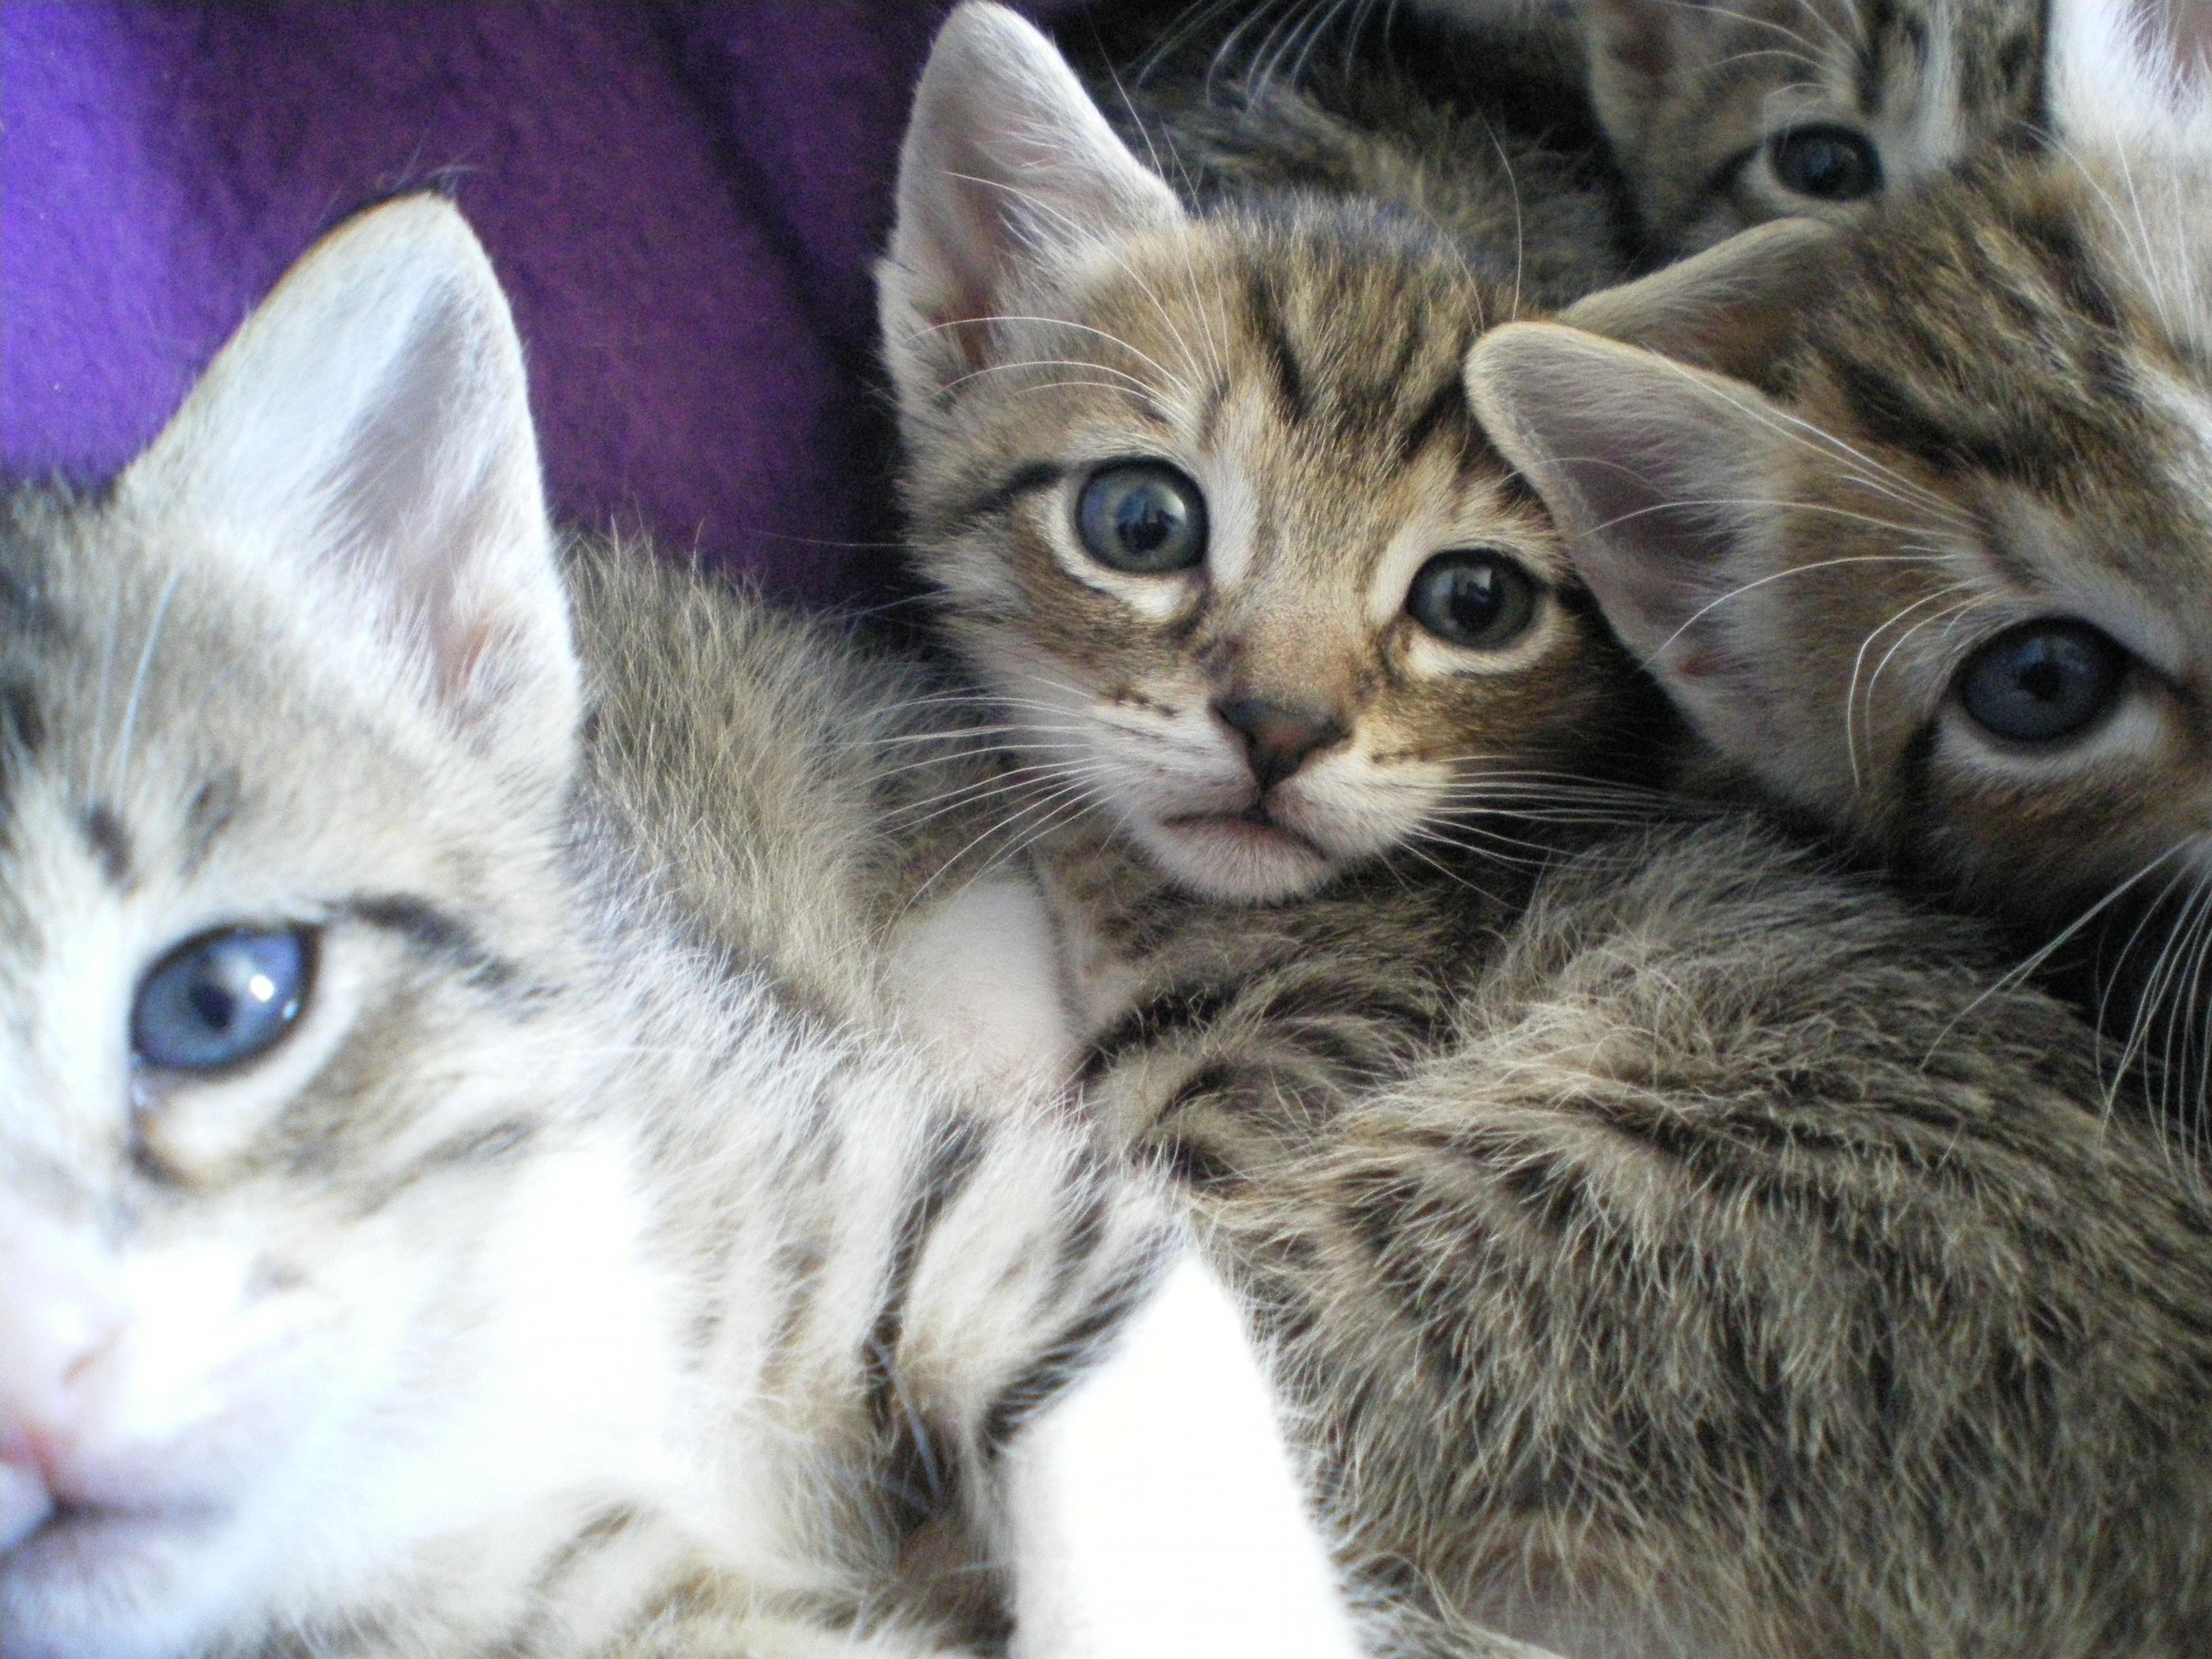 Free kitten fauna eyes whiskers savannah vertebrate